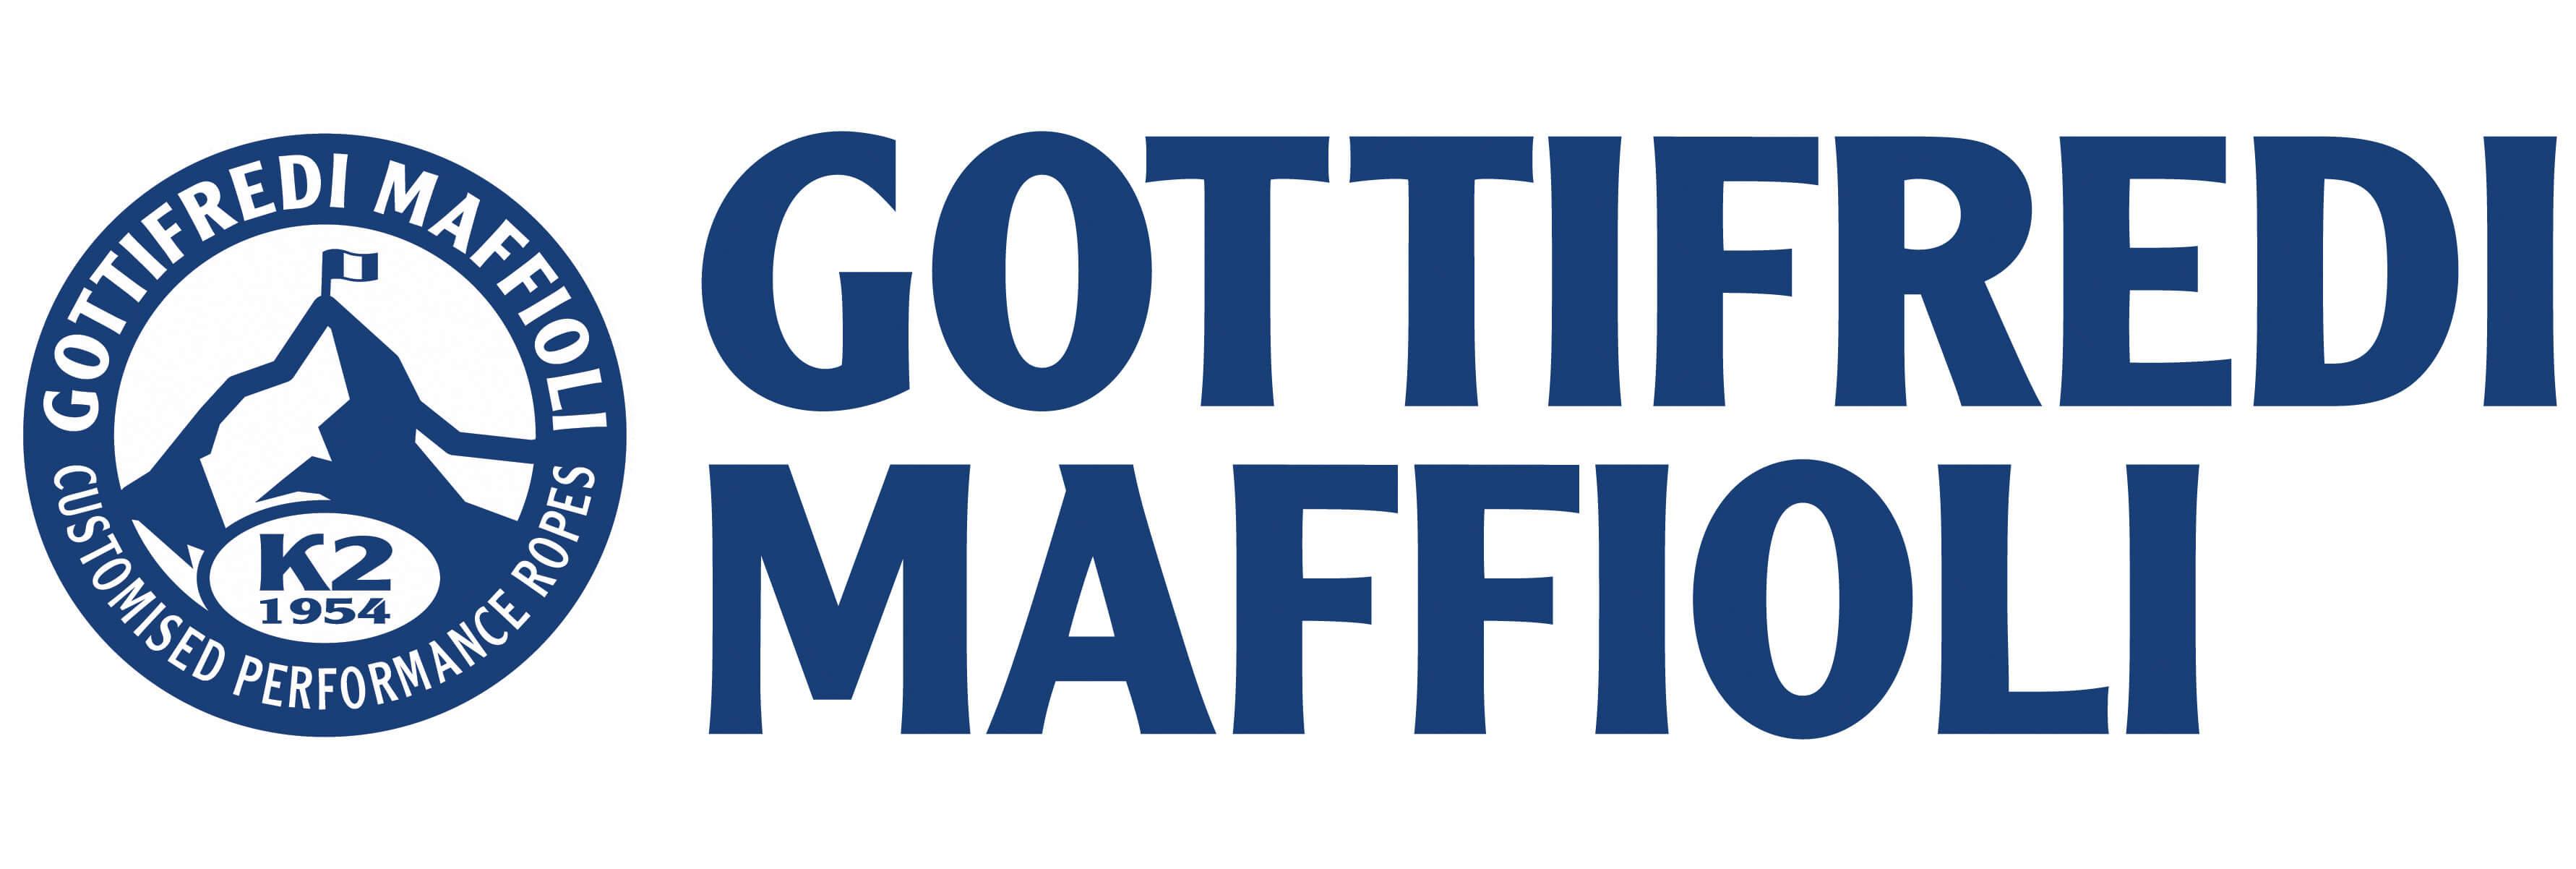 Gottifredi Maffioli's logo